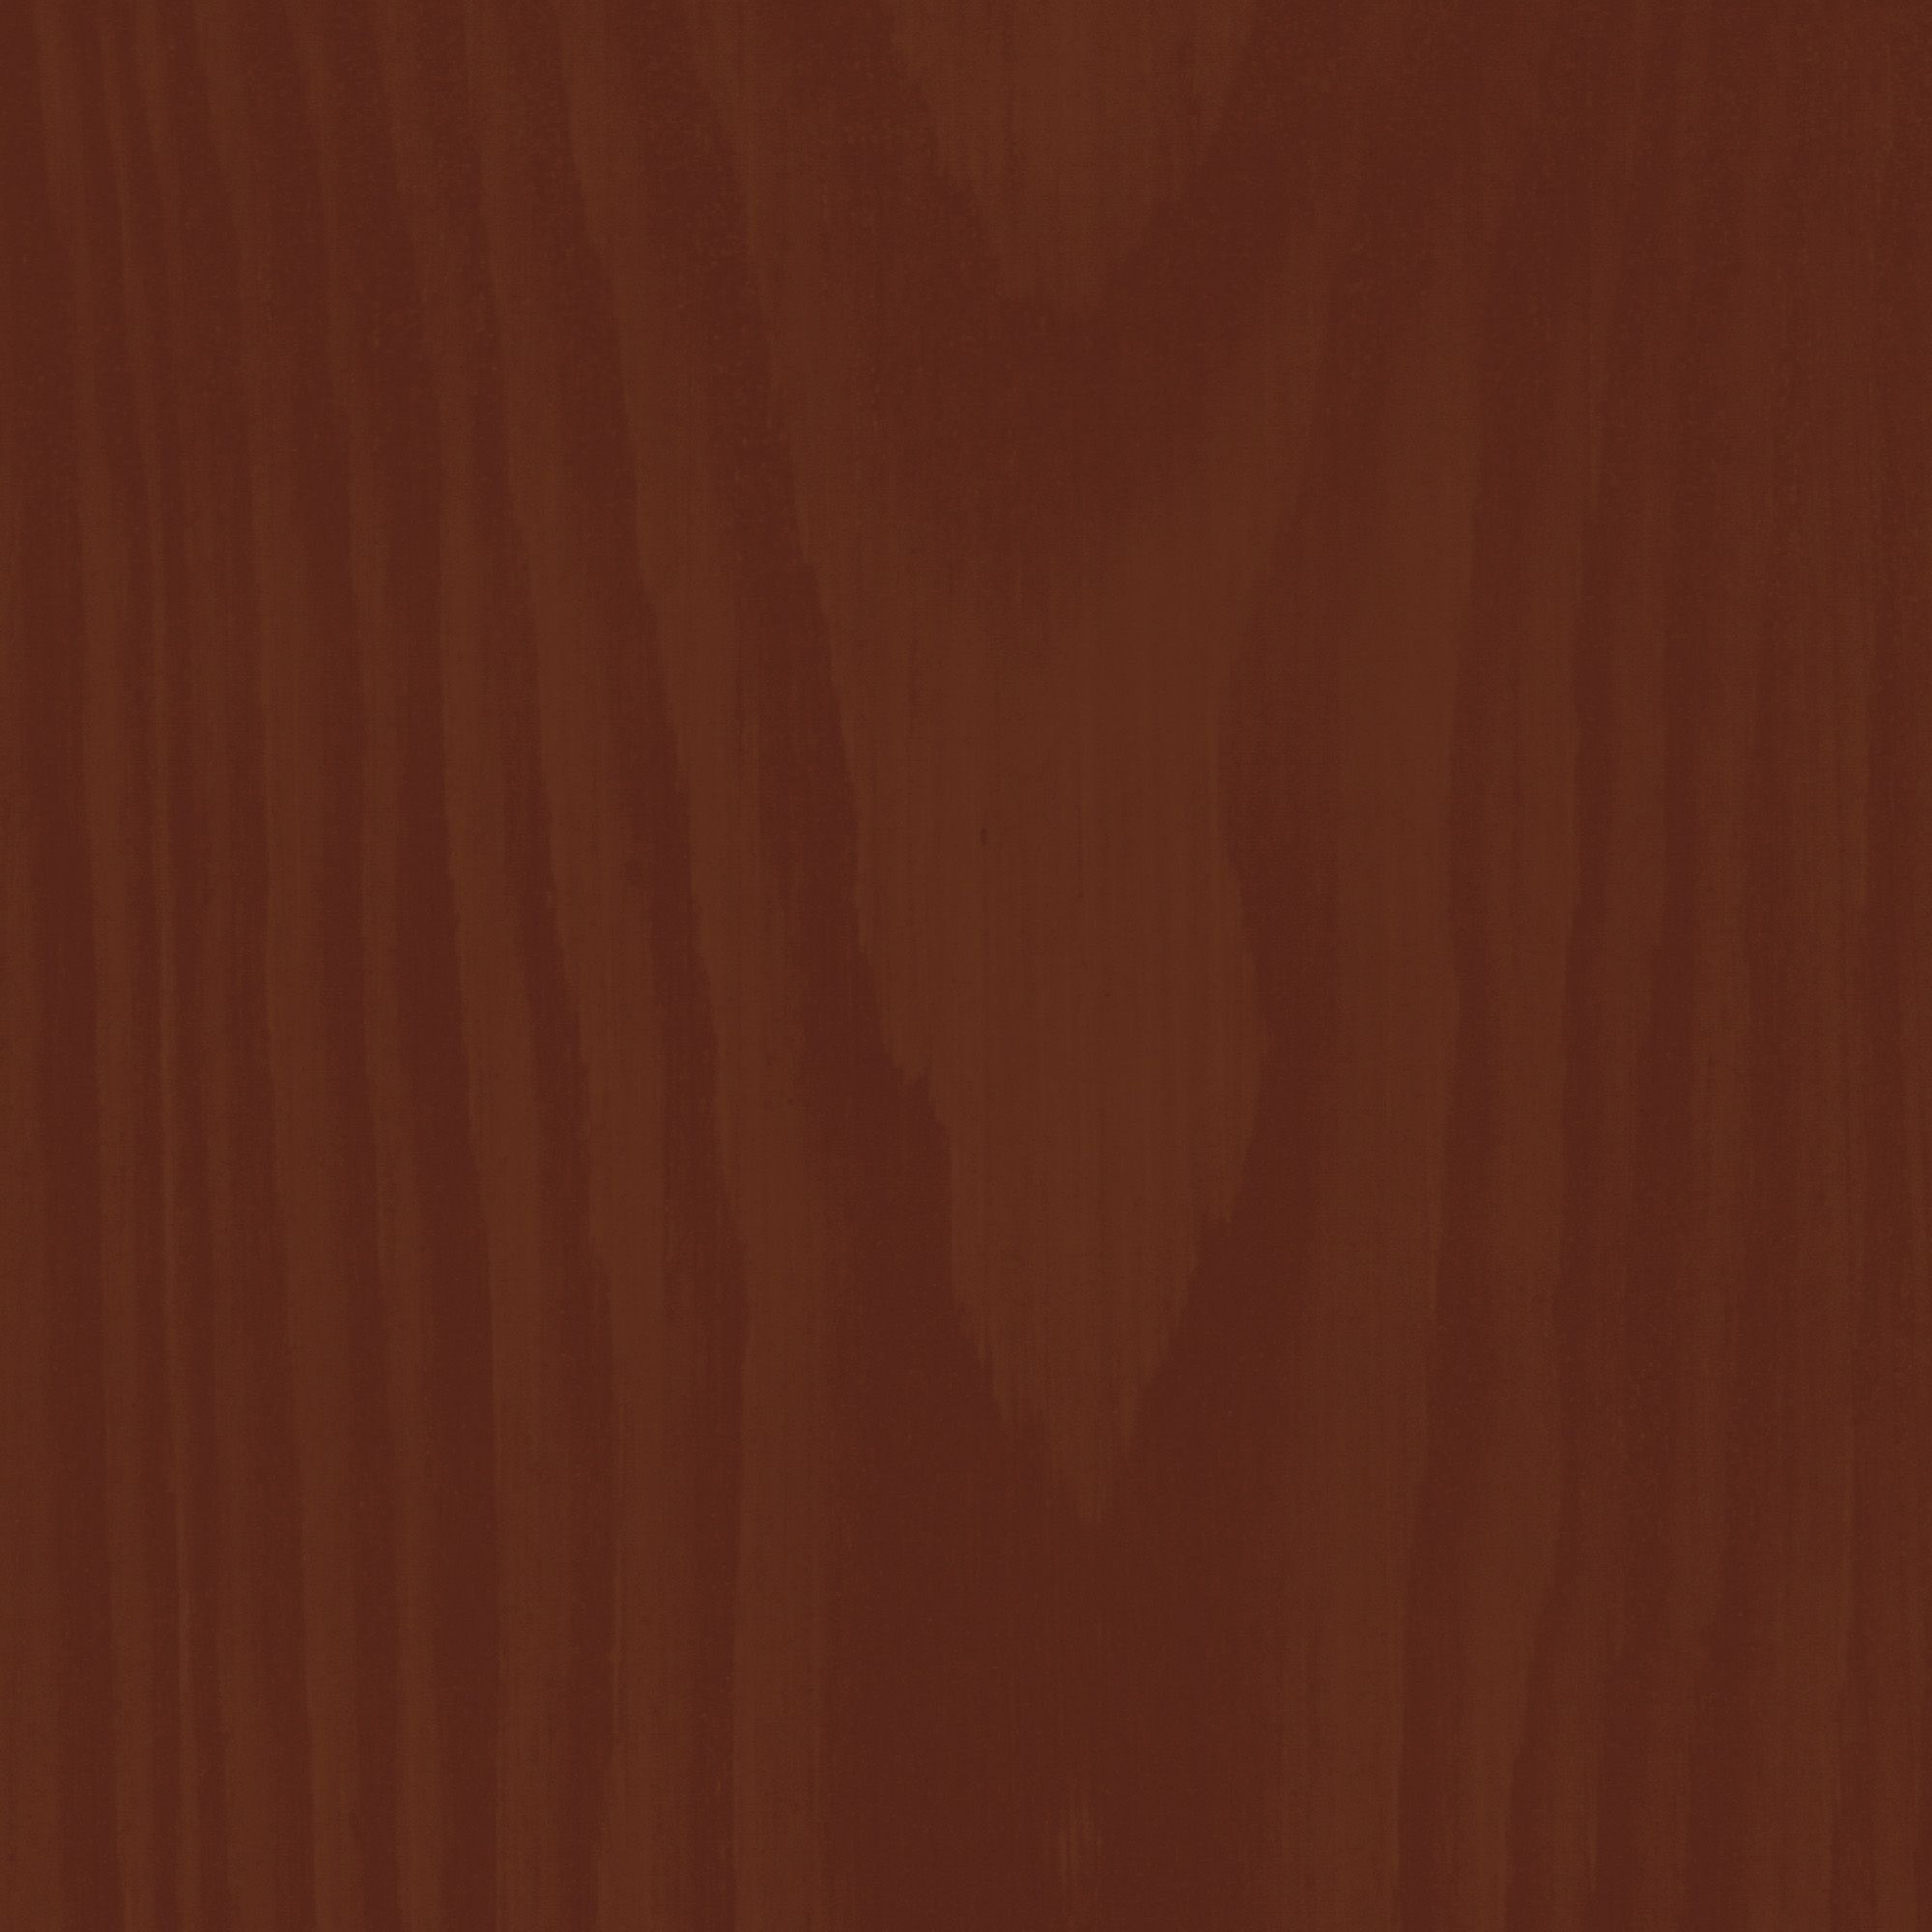 Ronseal Diamond Hard Walnut Satin Interior Varnish 0.25l